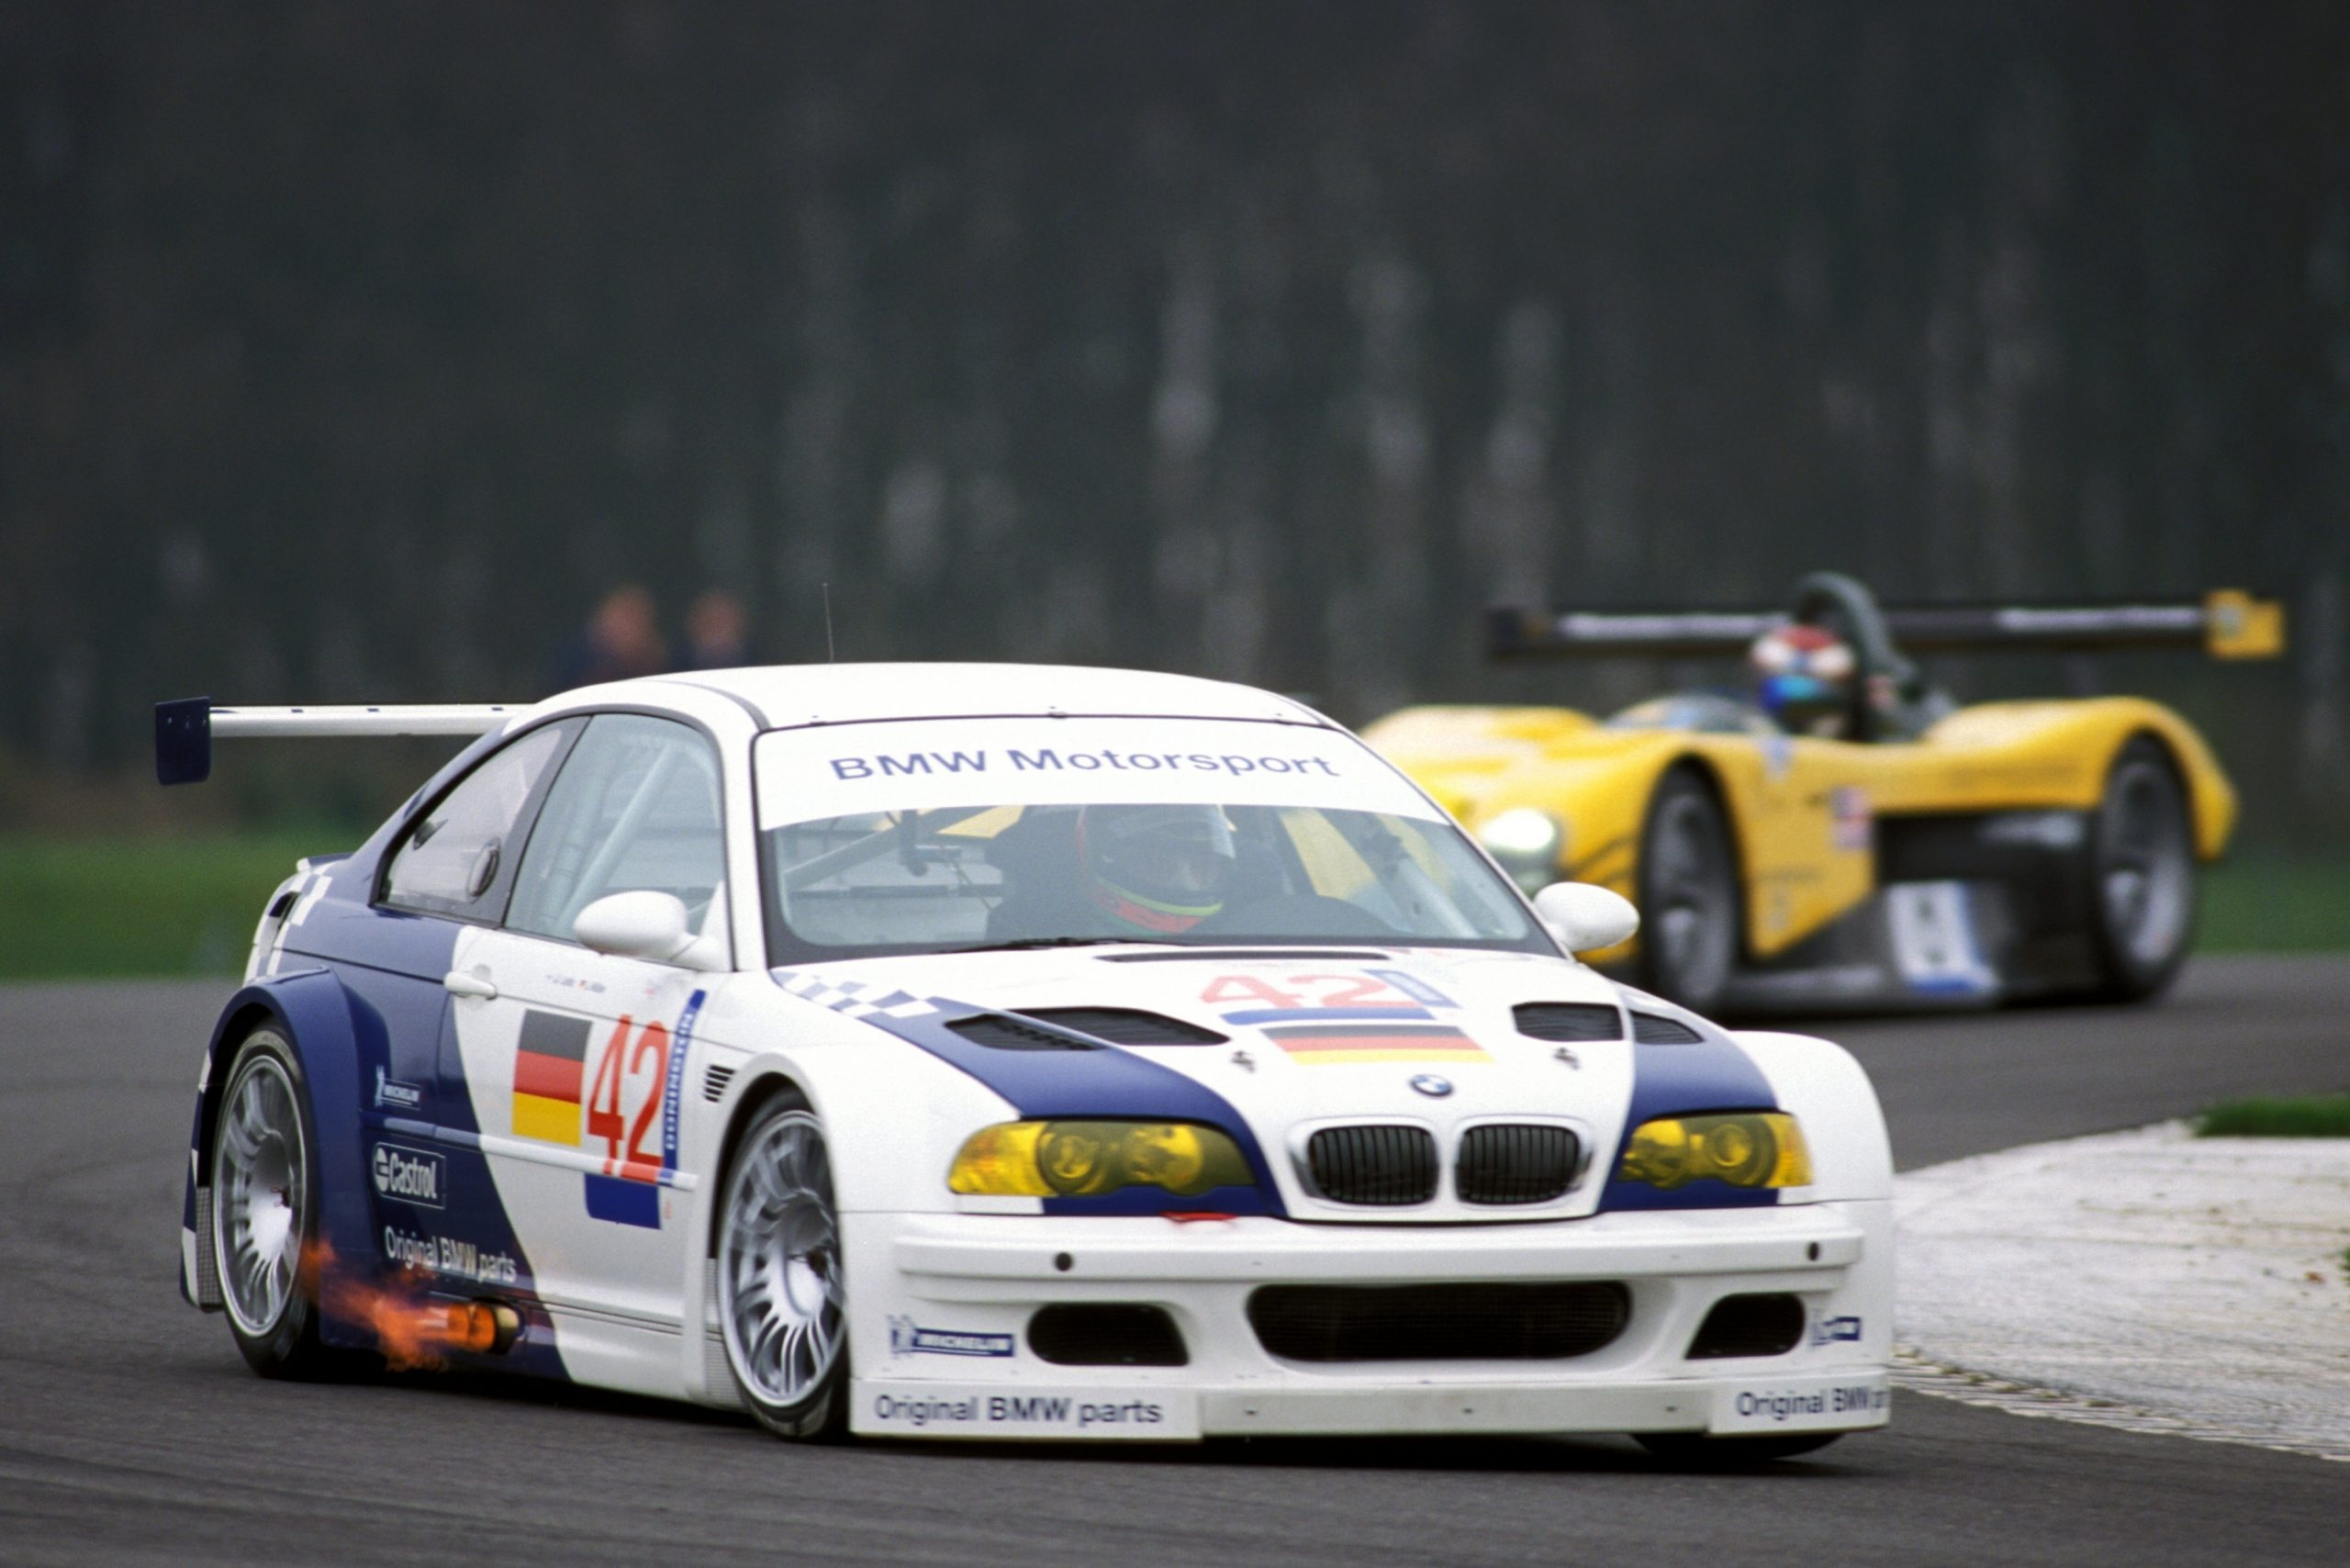 Jorg Muller won 2001 American Le Mans Series crown with M3 GTR